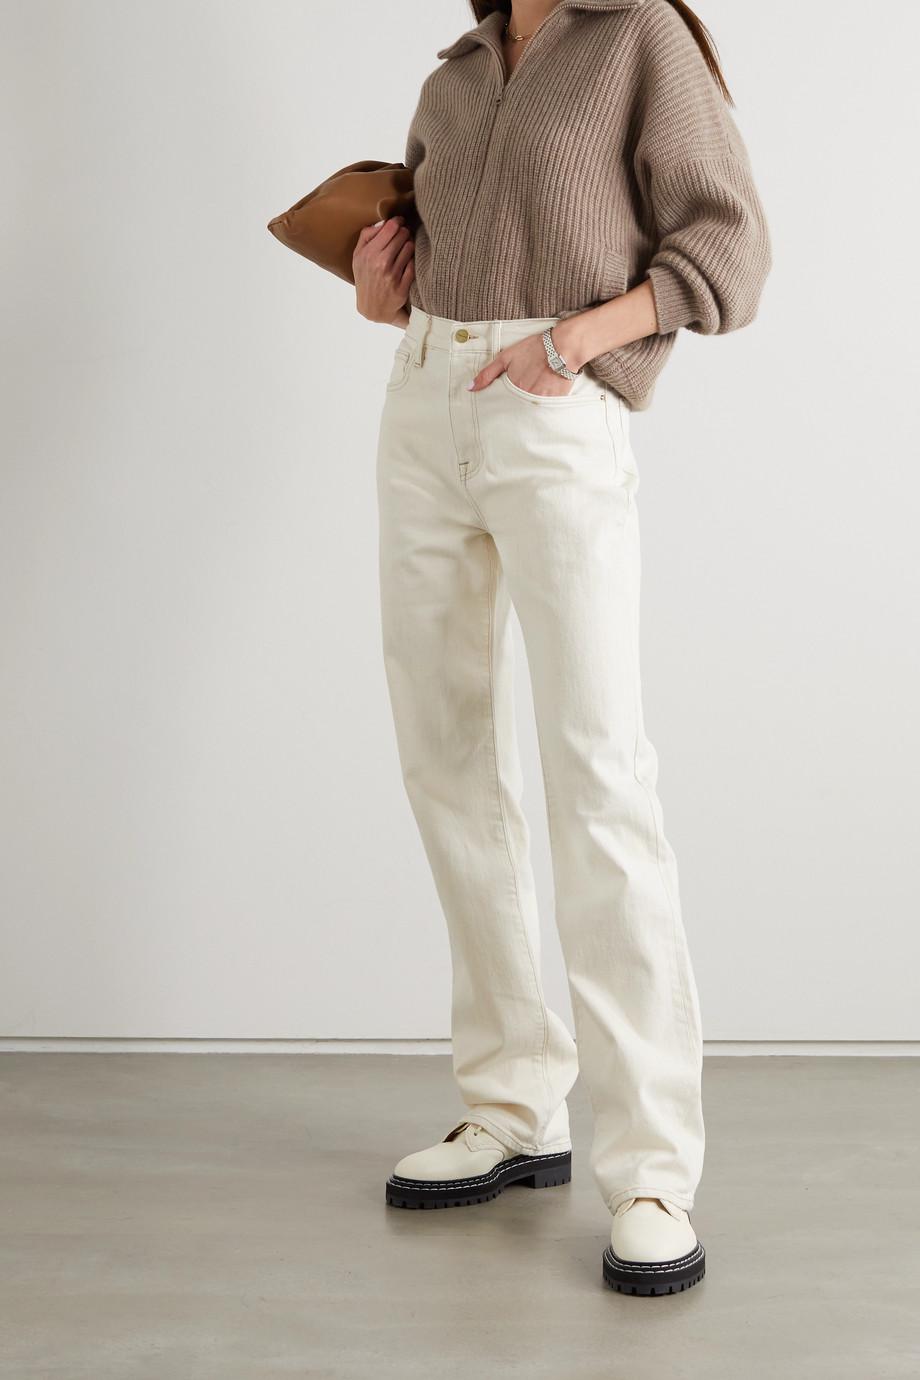 Lisa Yang Mela ribbed cashmere cardigan